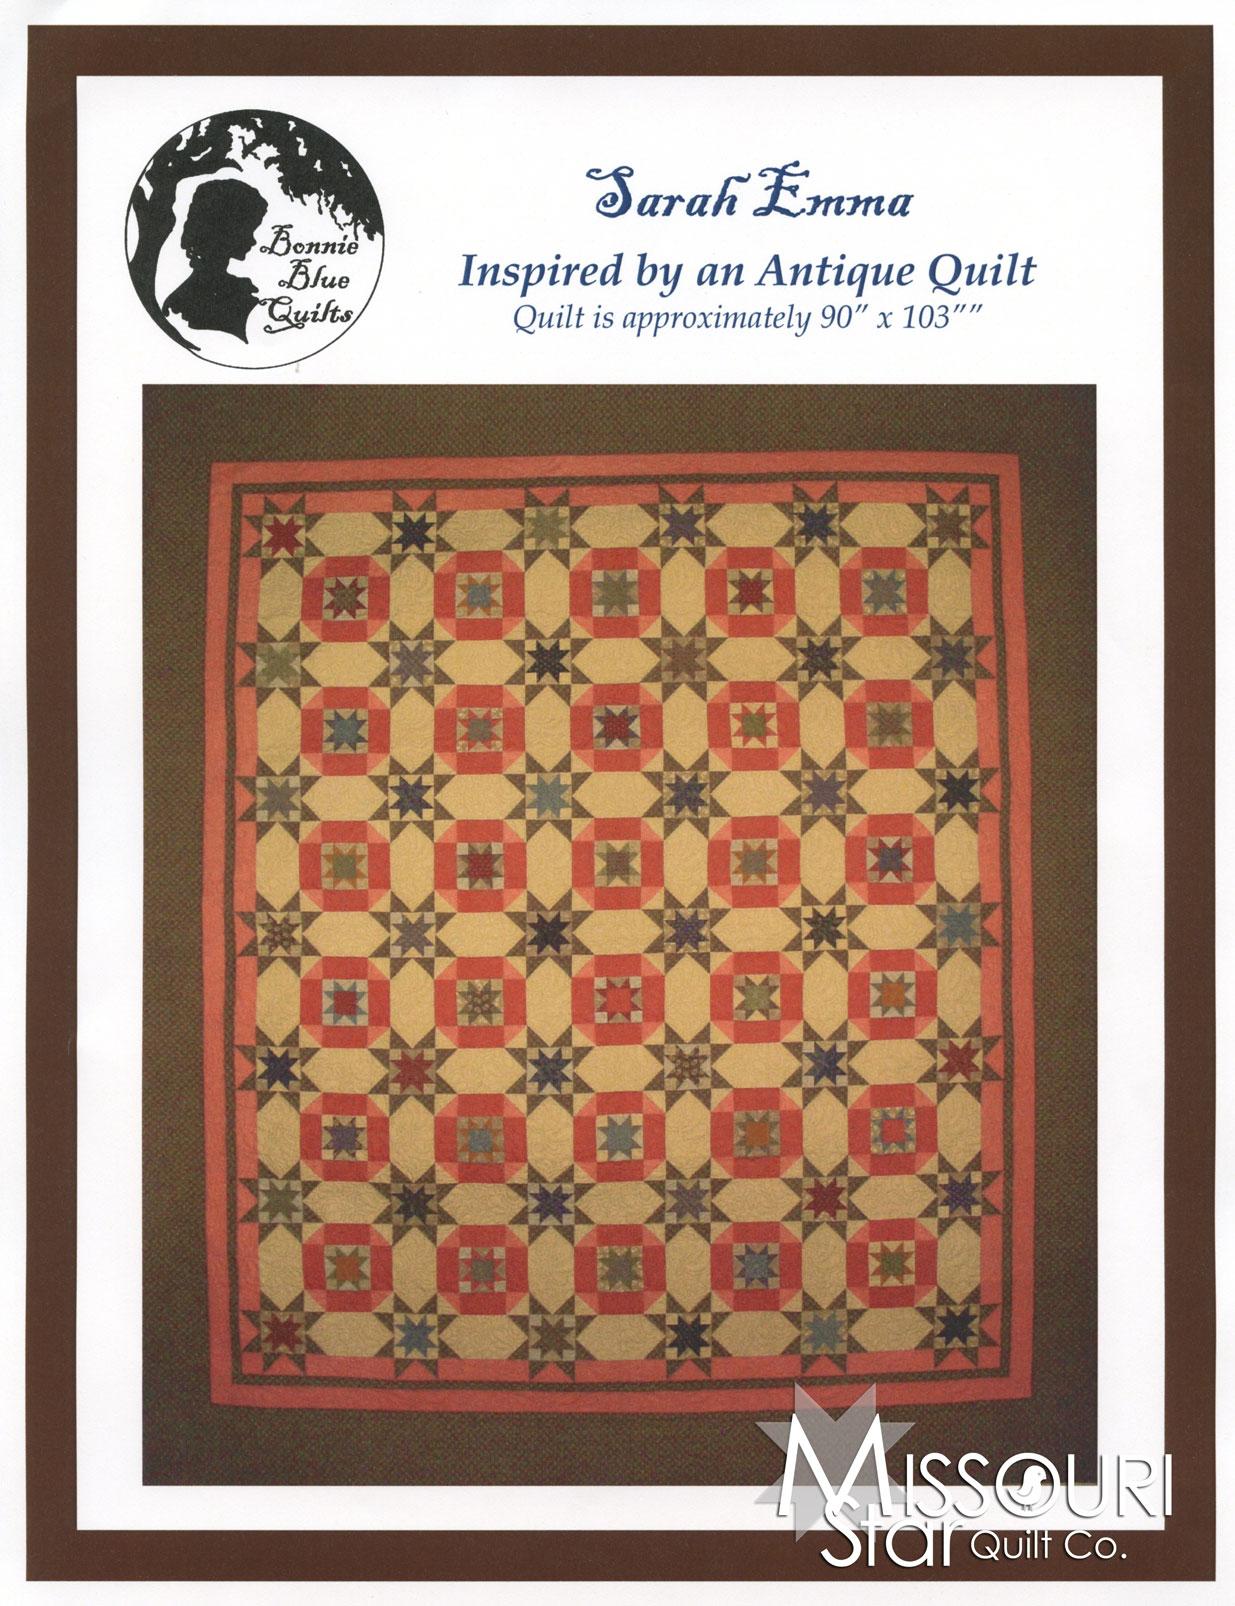 Sarah Emma Quilt Pattern - Paula Barnes - Bonnie Blue Quilts ... : emma quilt pattern - Adamdwight.com